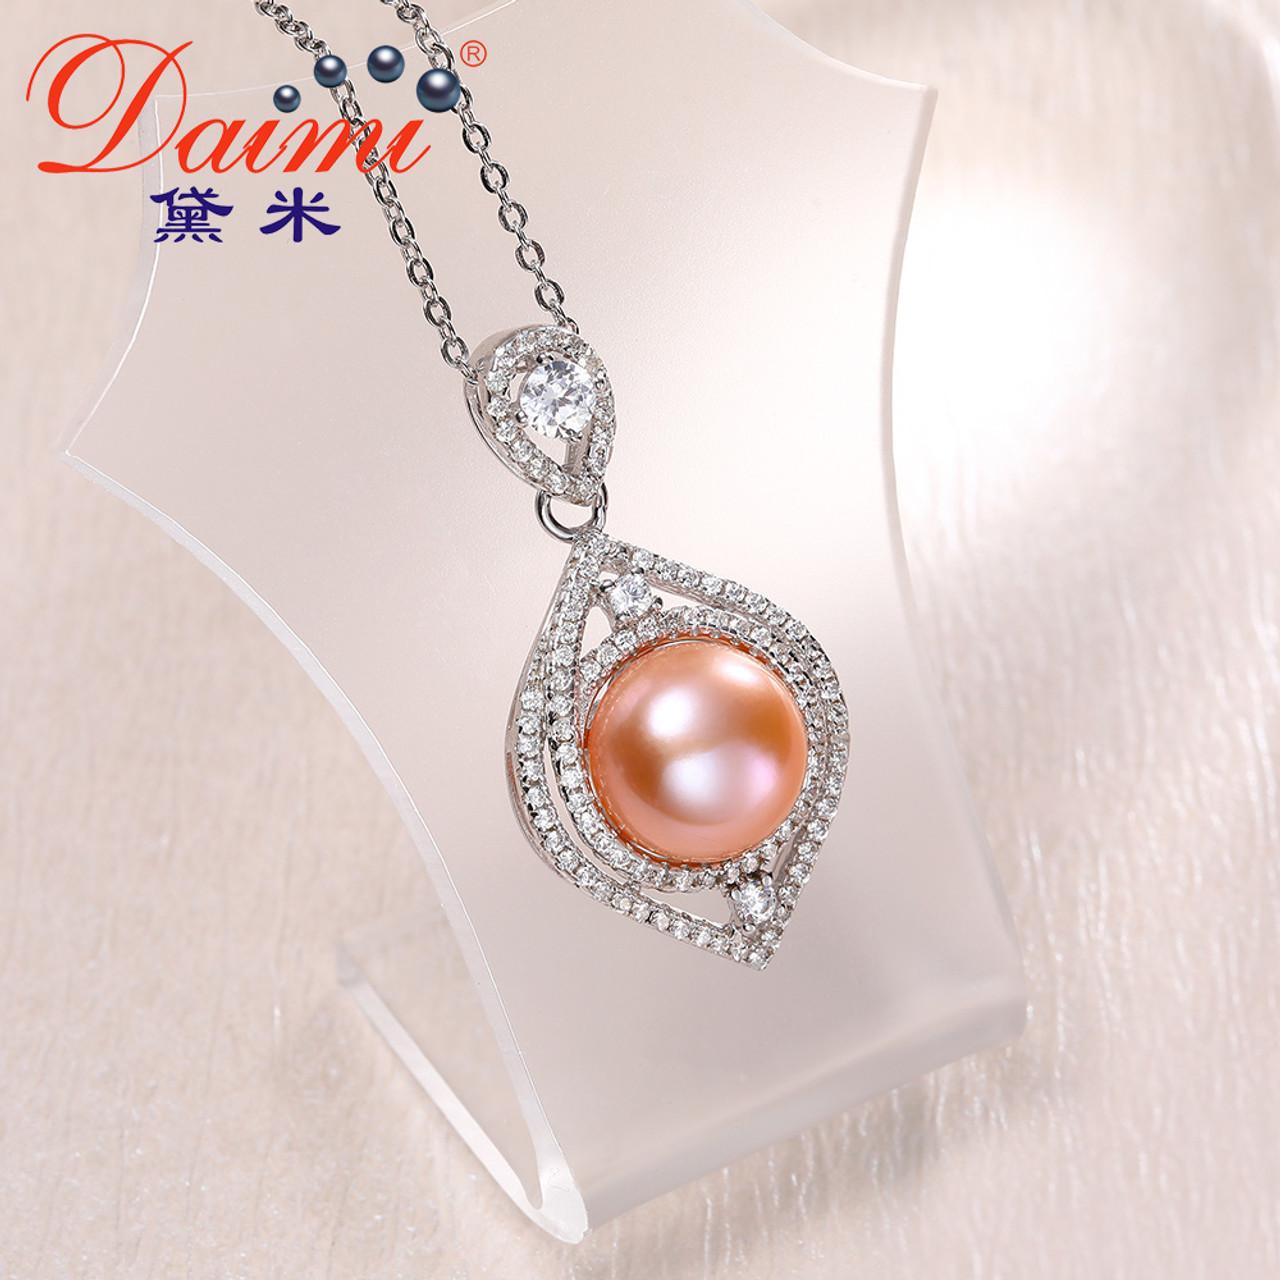 Daimi shiny crystal pink pearl pendant 95 10mm big freshwater daimi shiny crystal pink pearl pendant 95 10mm big freshwater pearl necklace 925 sterling silver aloadofball Image collections